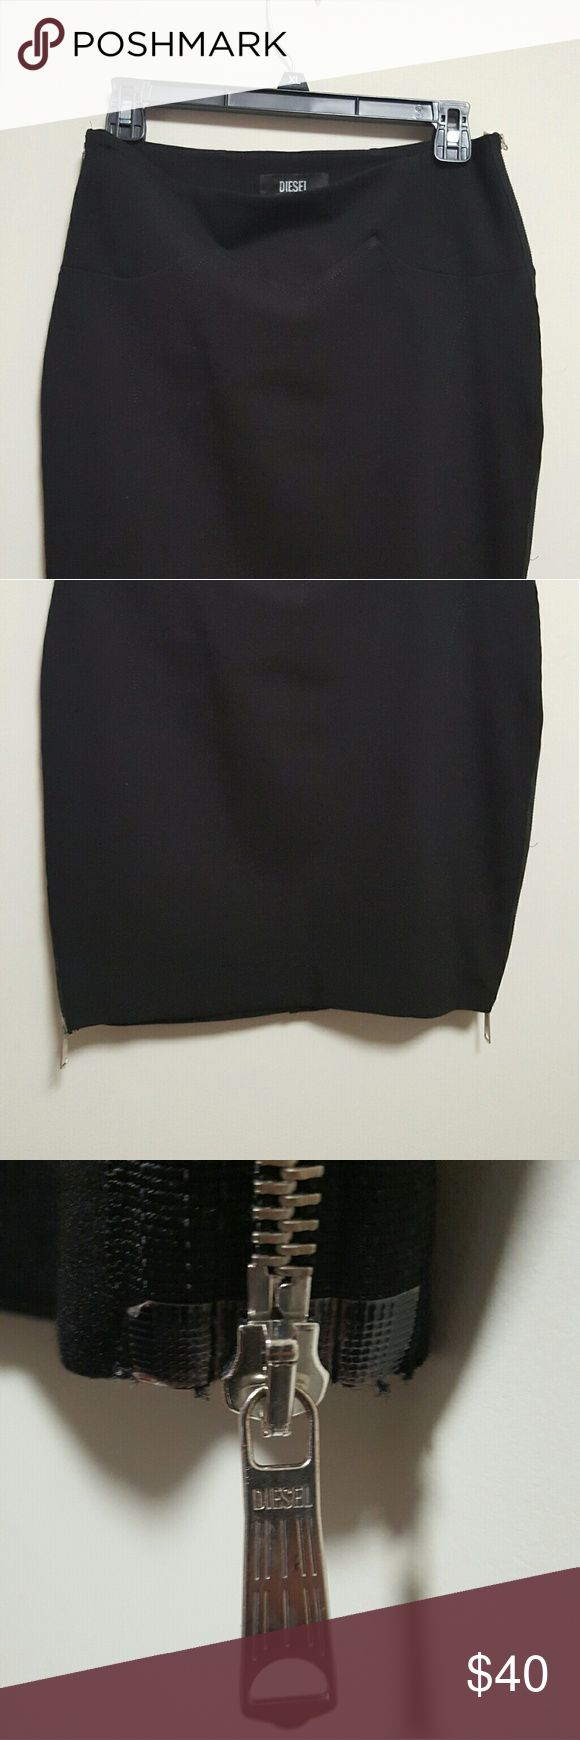 "Diesel skirt size medium Great condition, zipper on both sides. Hips -17"", length -13"". Diesel Skirts Mini"